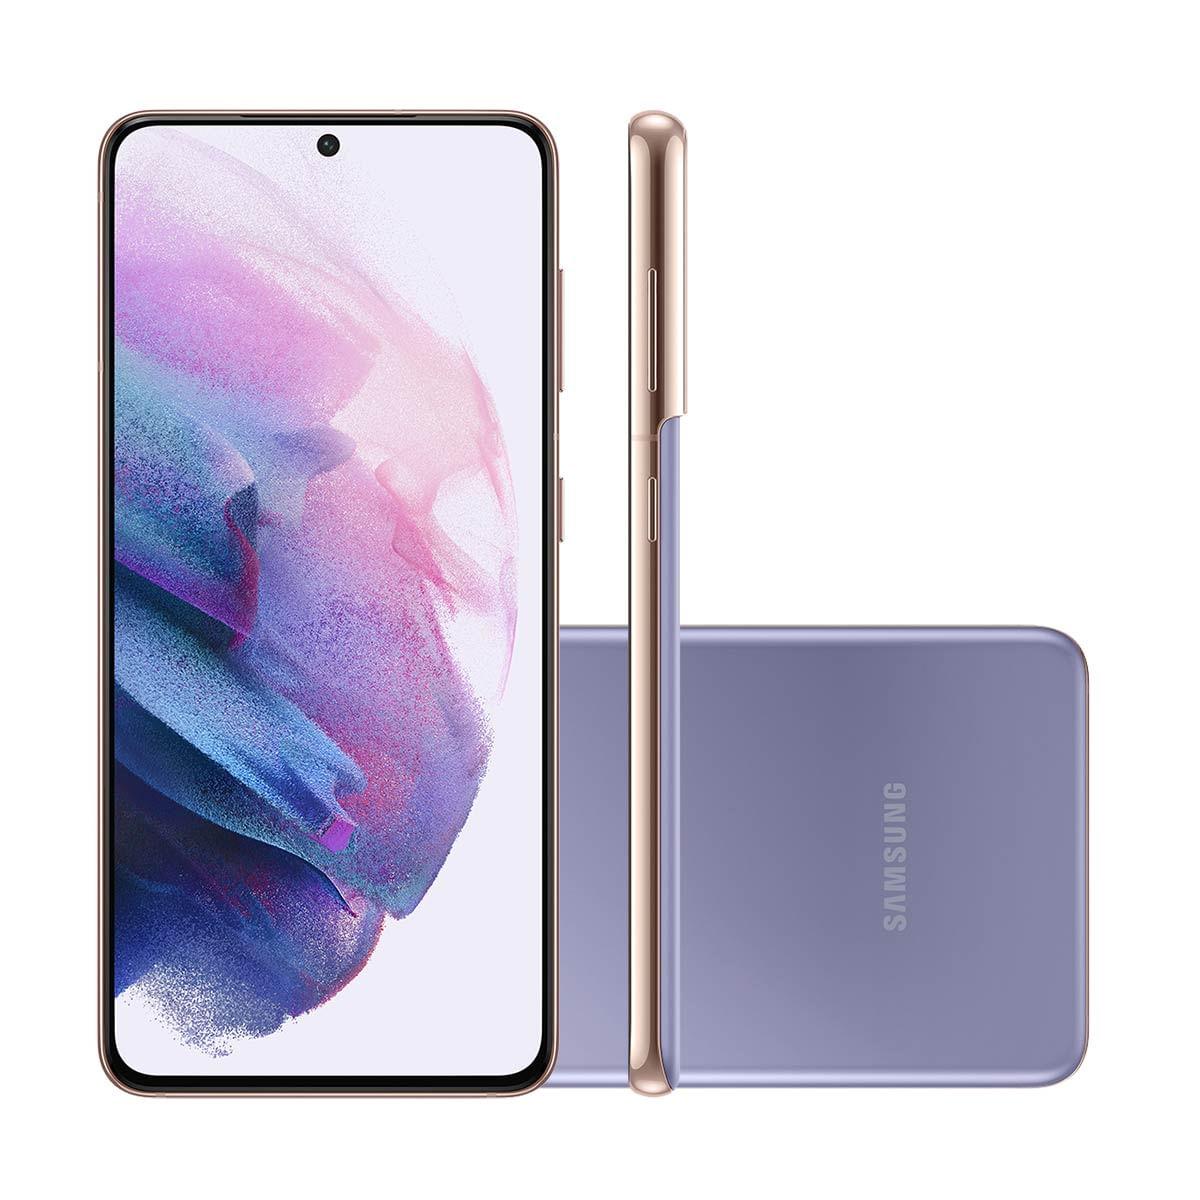 "Smartphone Samsung Galaxy S21 5G 128GB Violeta Tela 6.2"" Câmera Tripla 64MP Selfie 10MP Dual Chip Android 11"